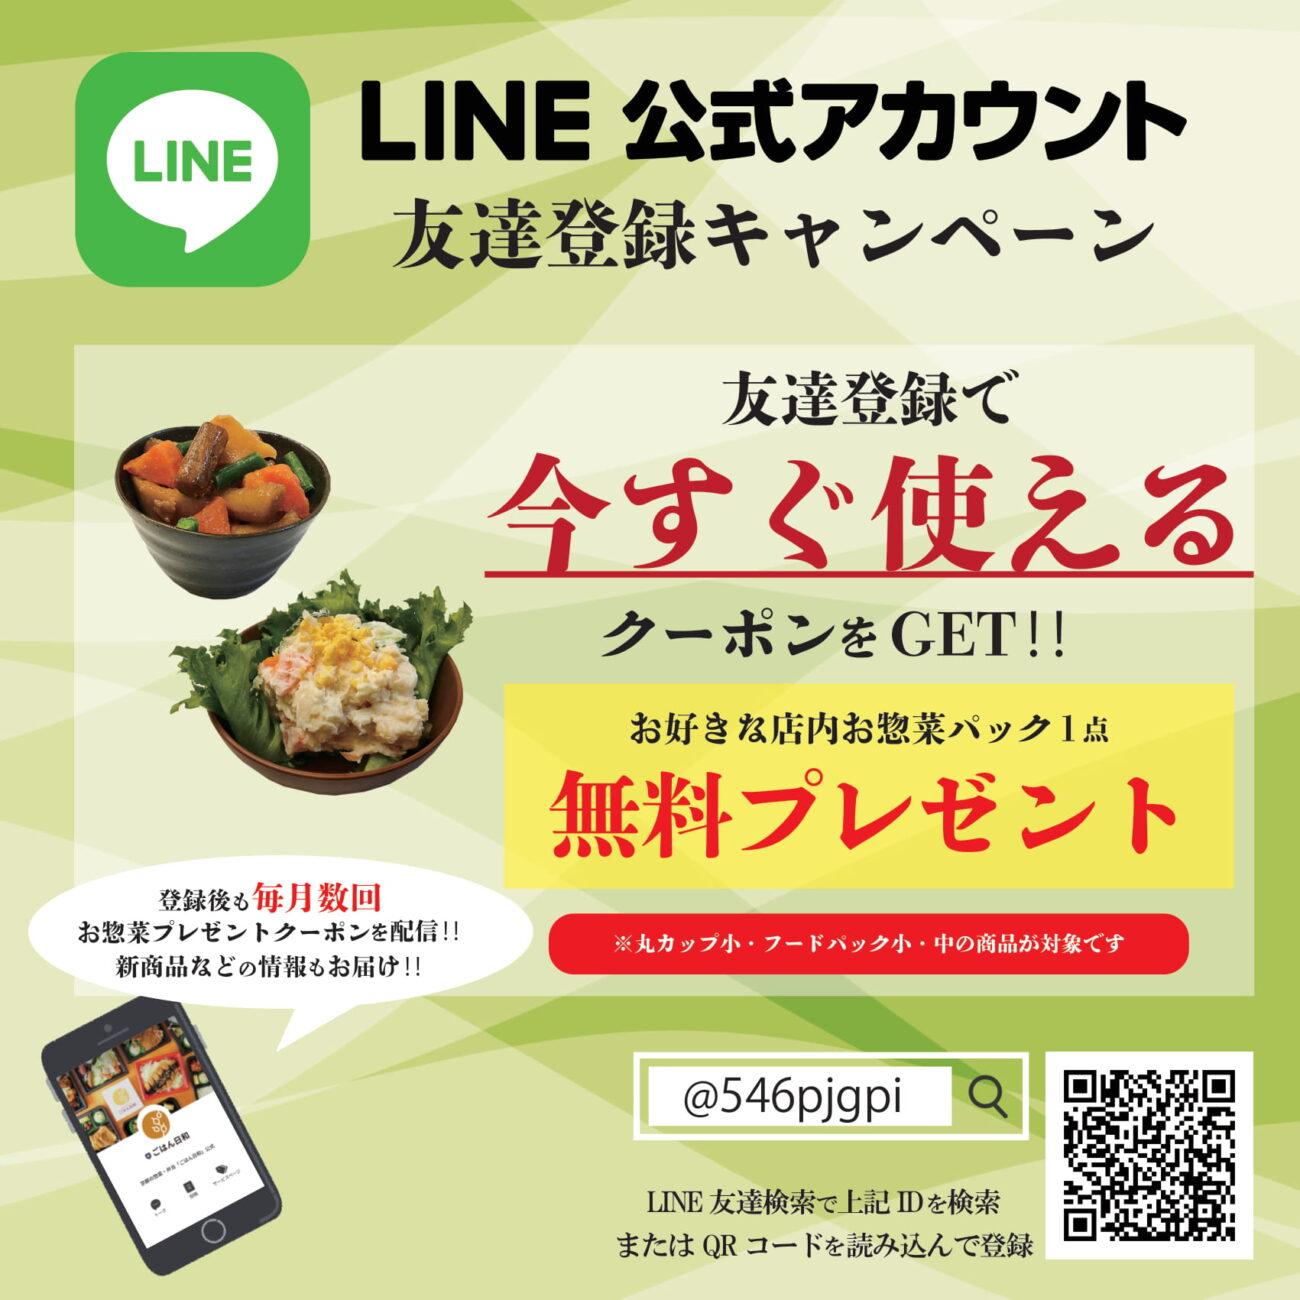 LINE公式アカウント友達登録キャンペーン